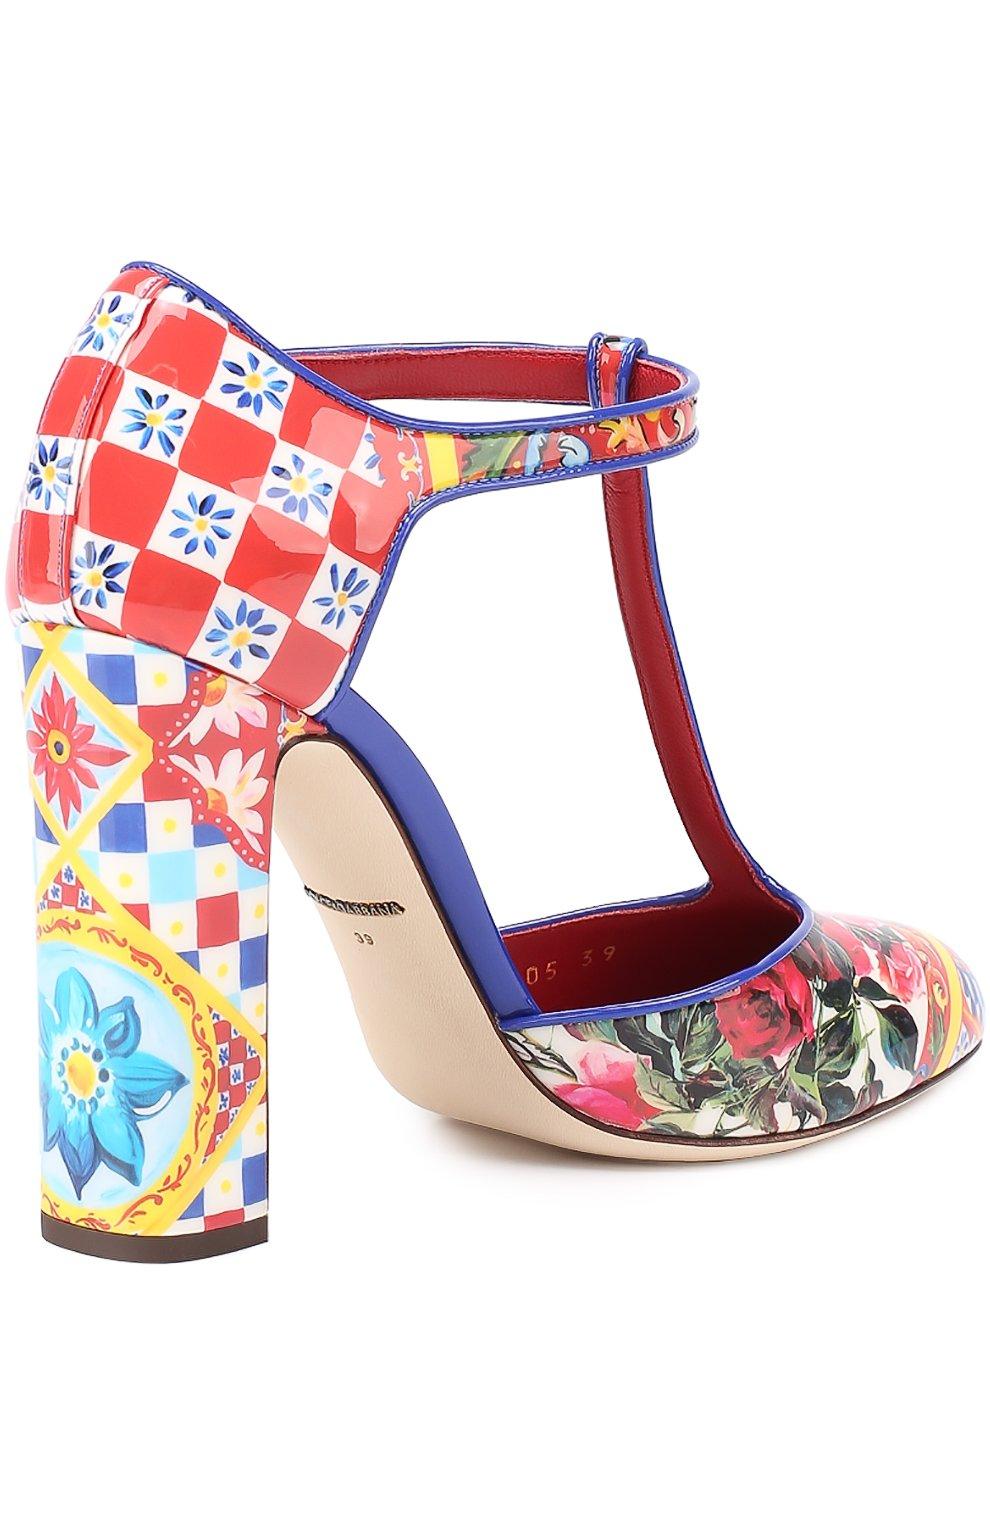 Туфли Vally с принтом на устойчивом каблуке Dolce & Gabbana разноцветные | Фото №4